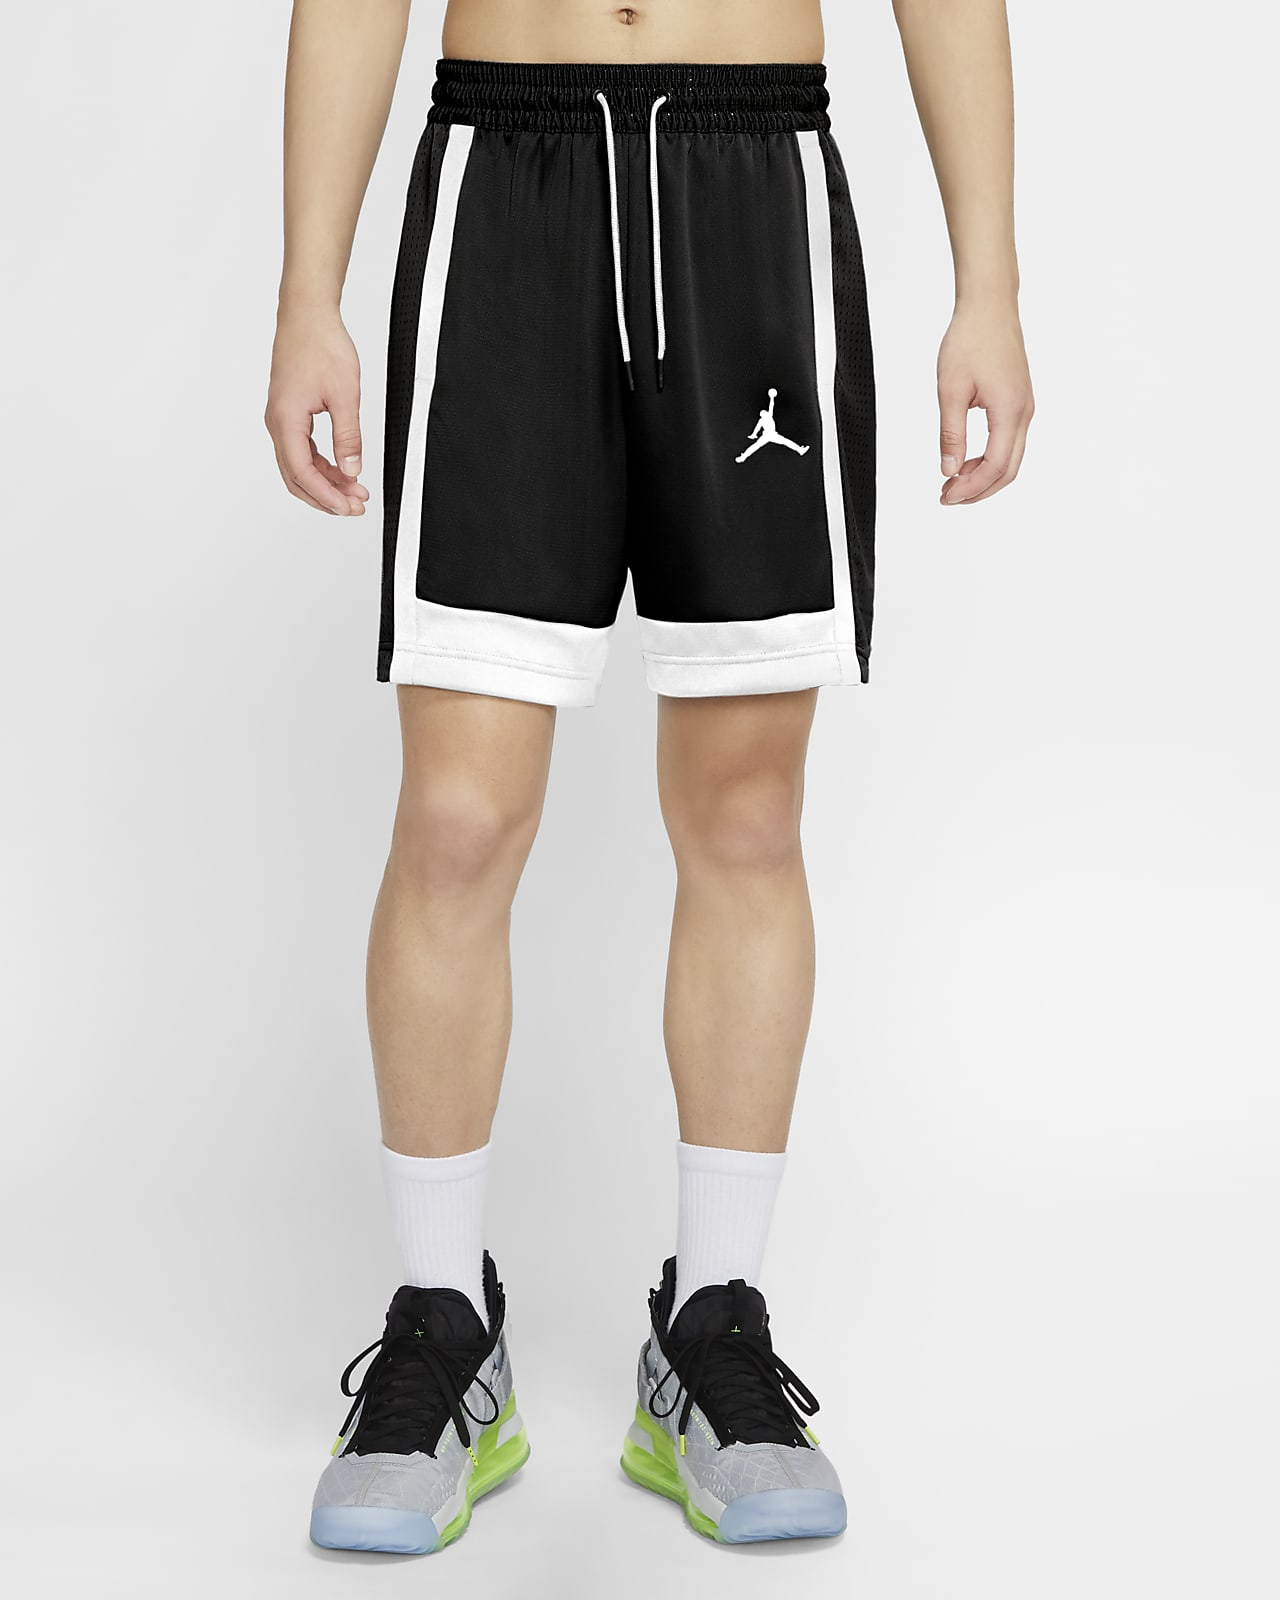 Jordan Air Men's Basketball Shorts. Nike GB